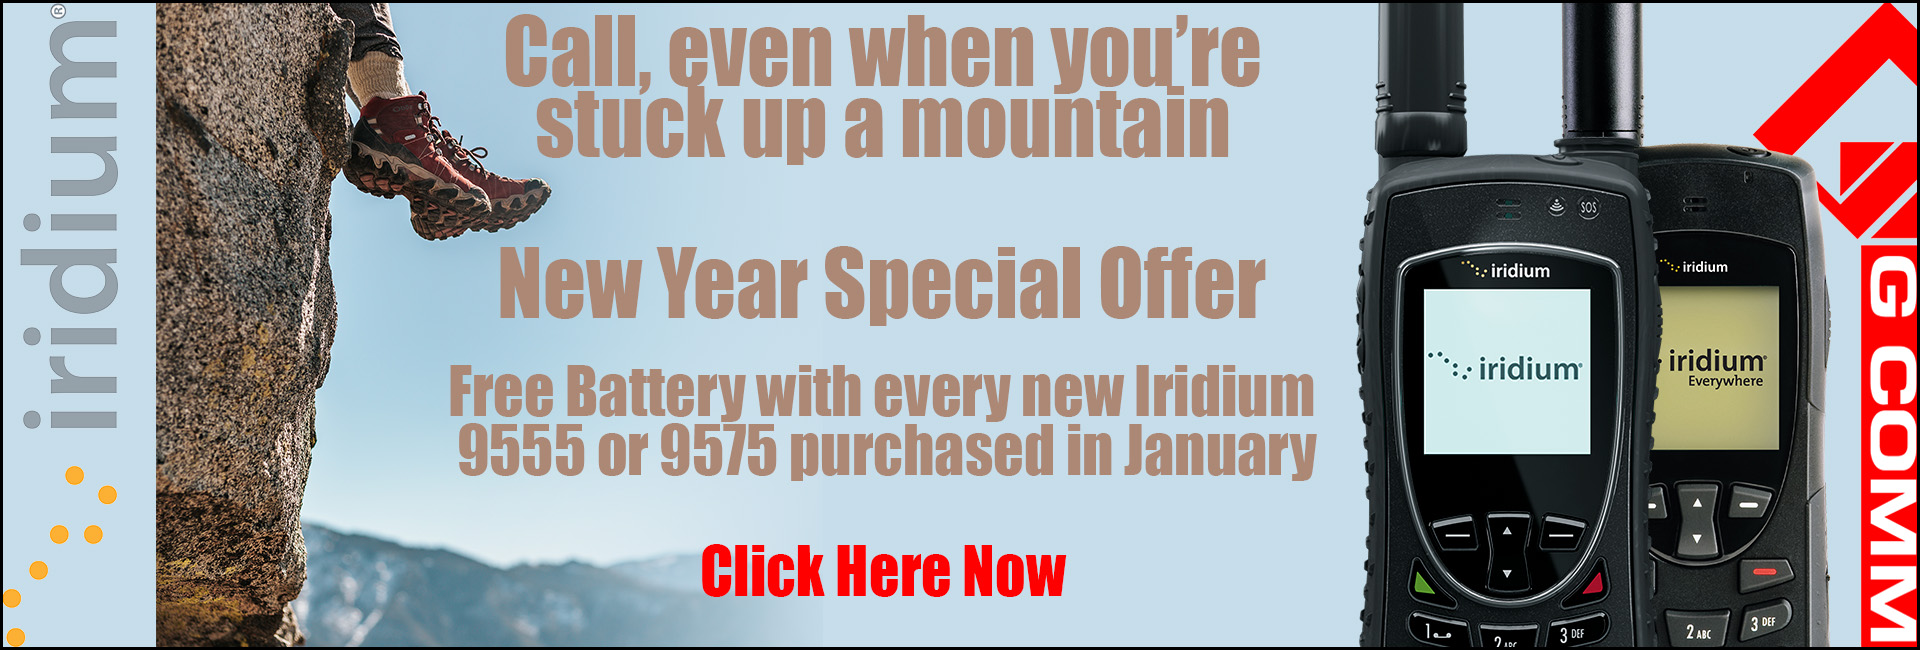 New Year special on Iridium satellite phones